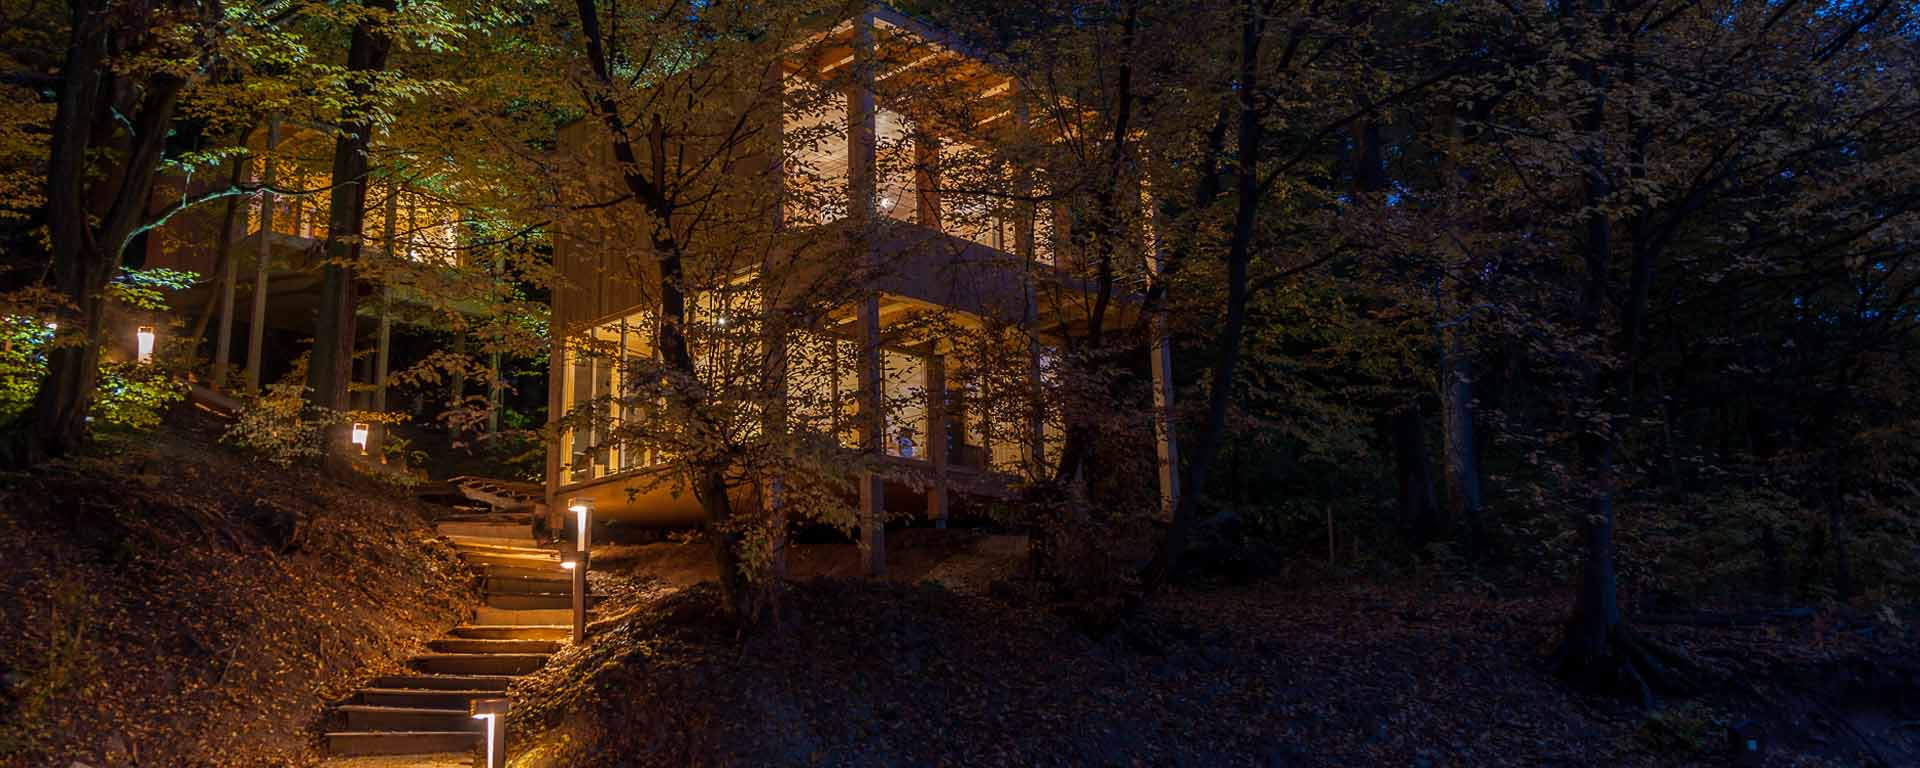 treehouses-noszvaj-lombhazak-fo-kep04